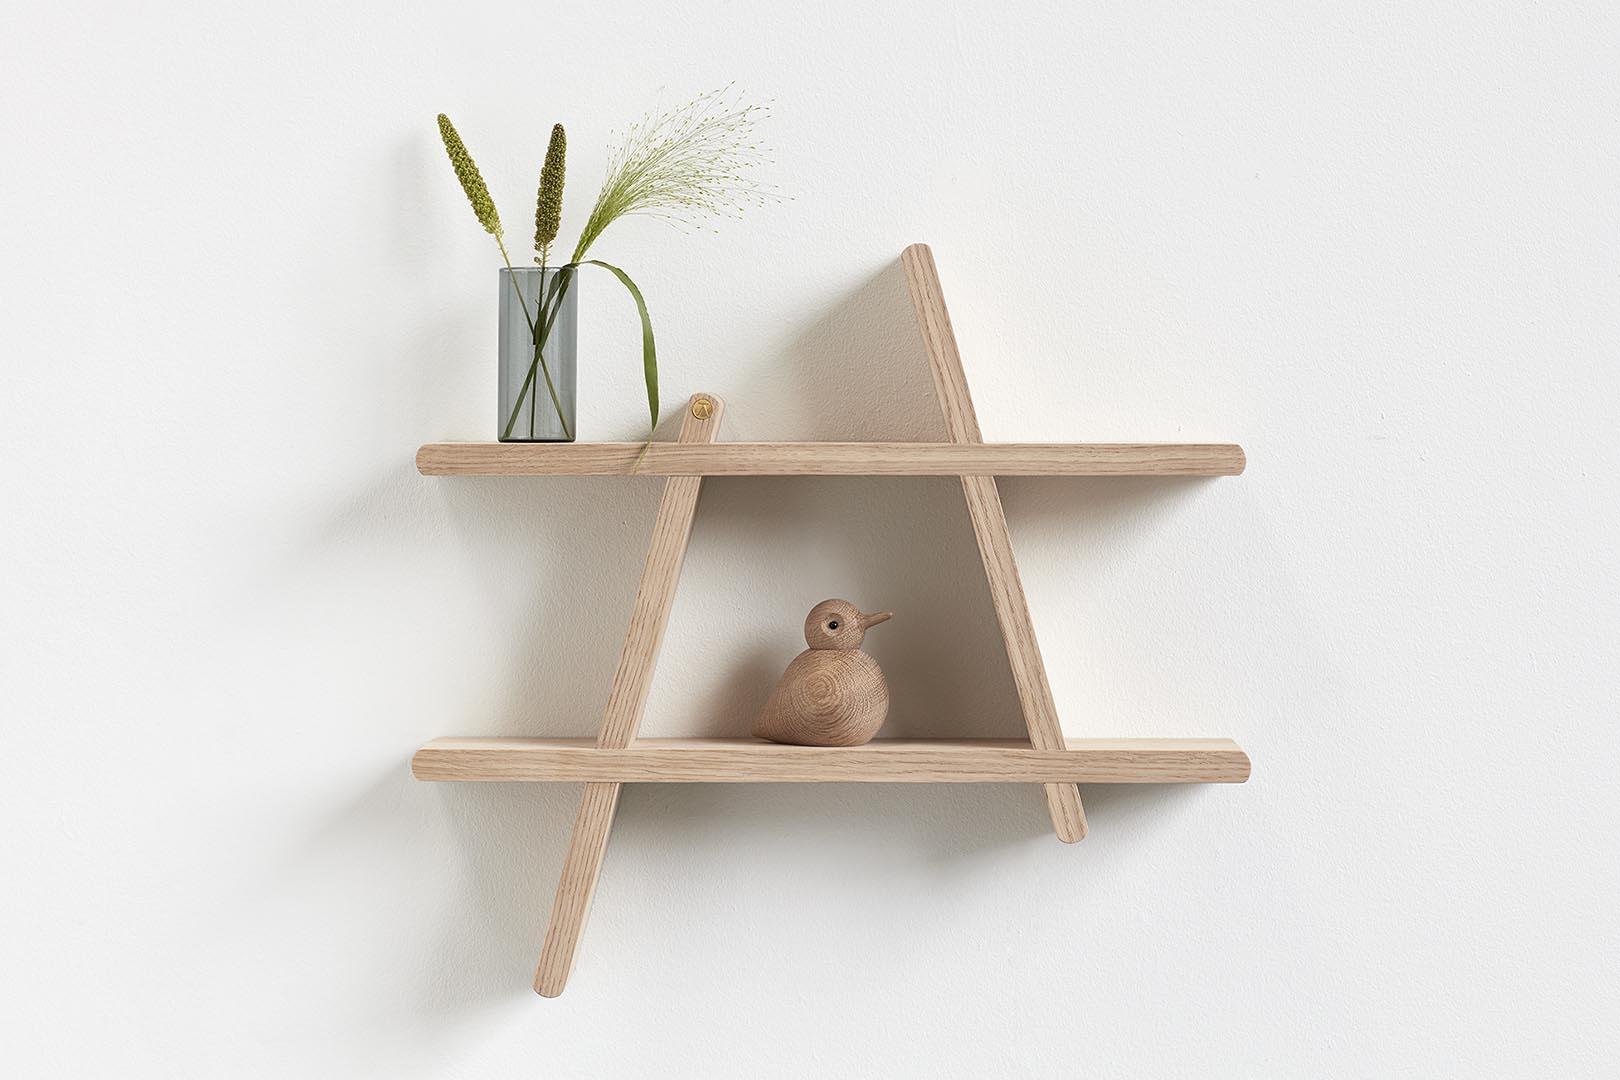 andersen-a-shelf-6